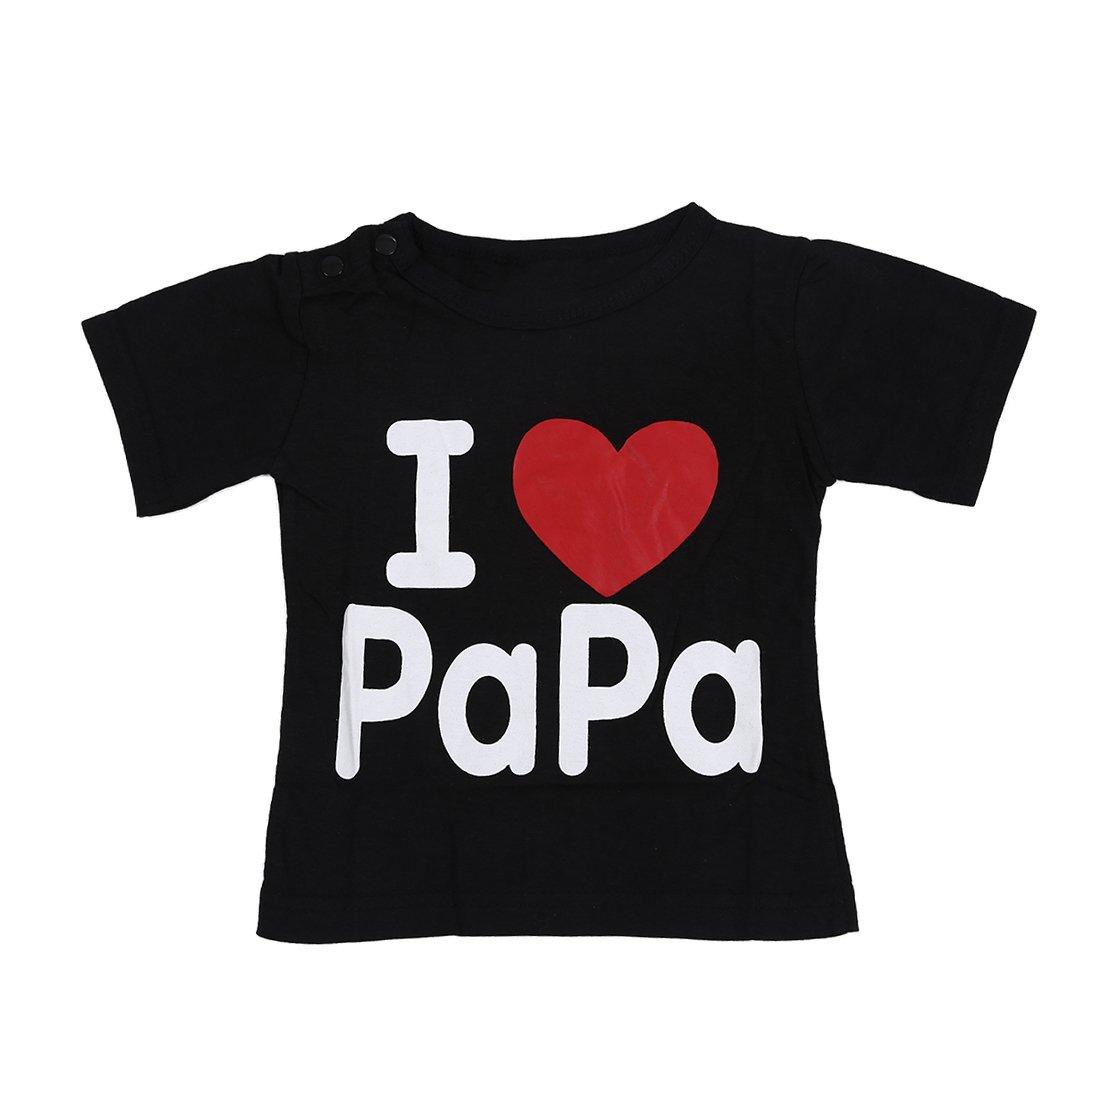 SODIAL Ropa de bebealgodon I love papa letras camiseta negra de manga corta I LOVE PAPA 110cm SODIAL(R) 050706H5